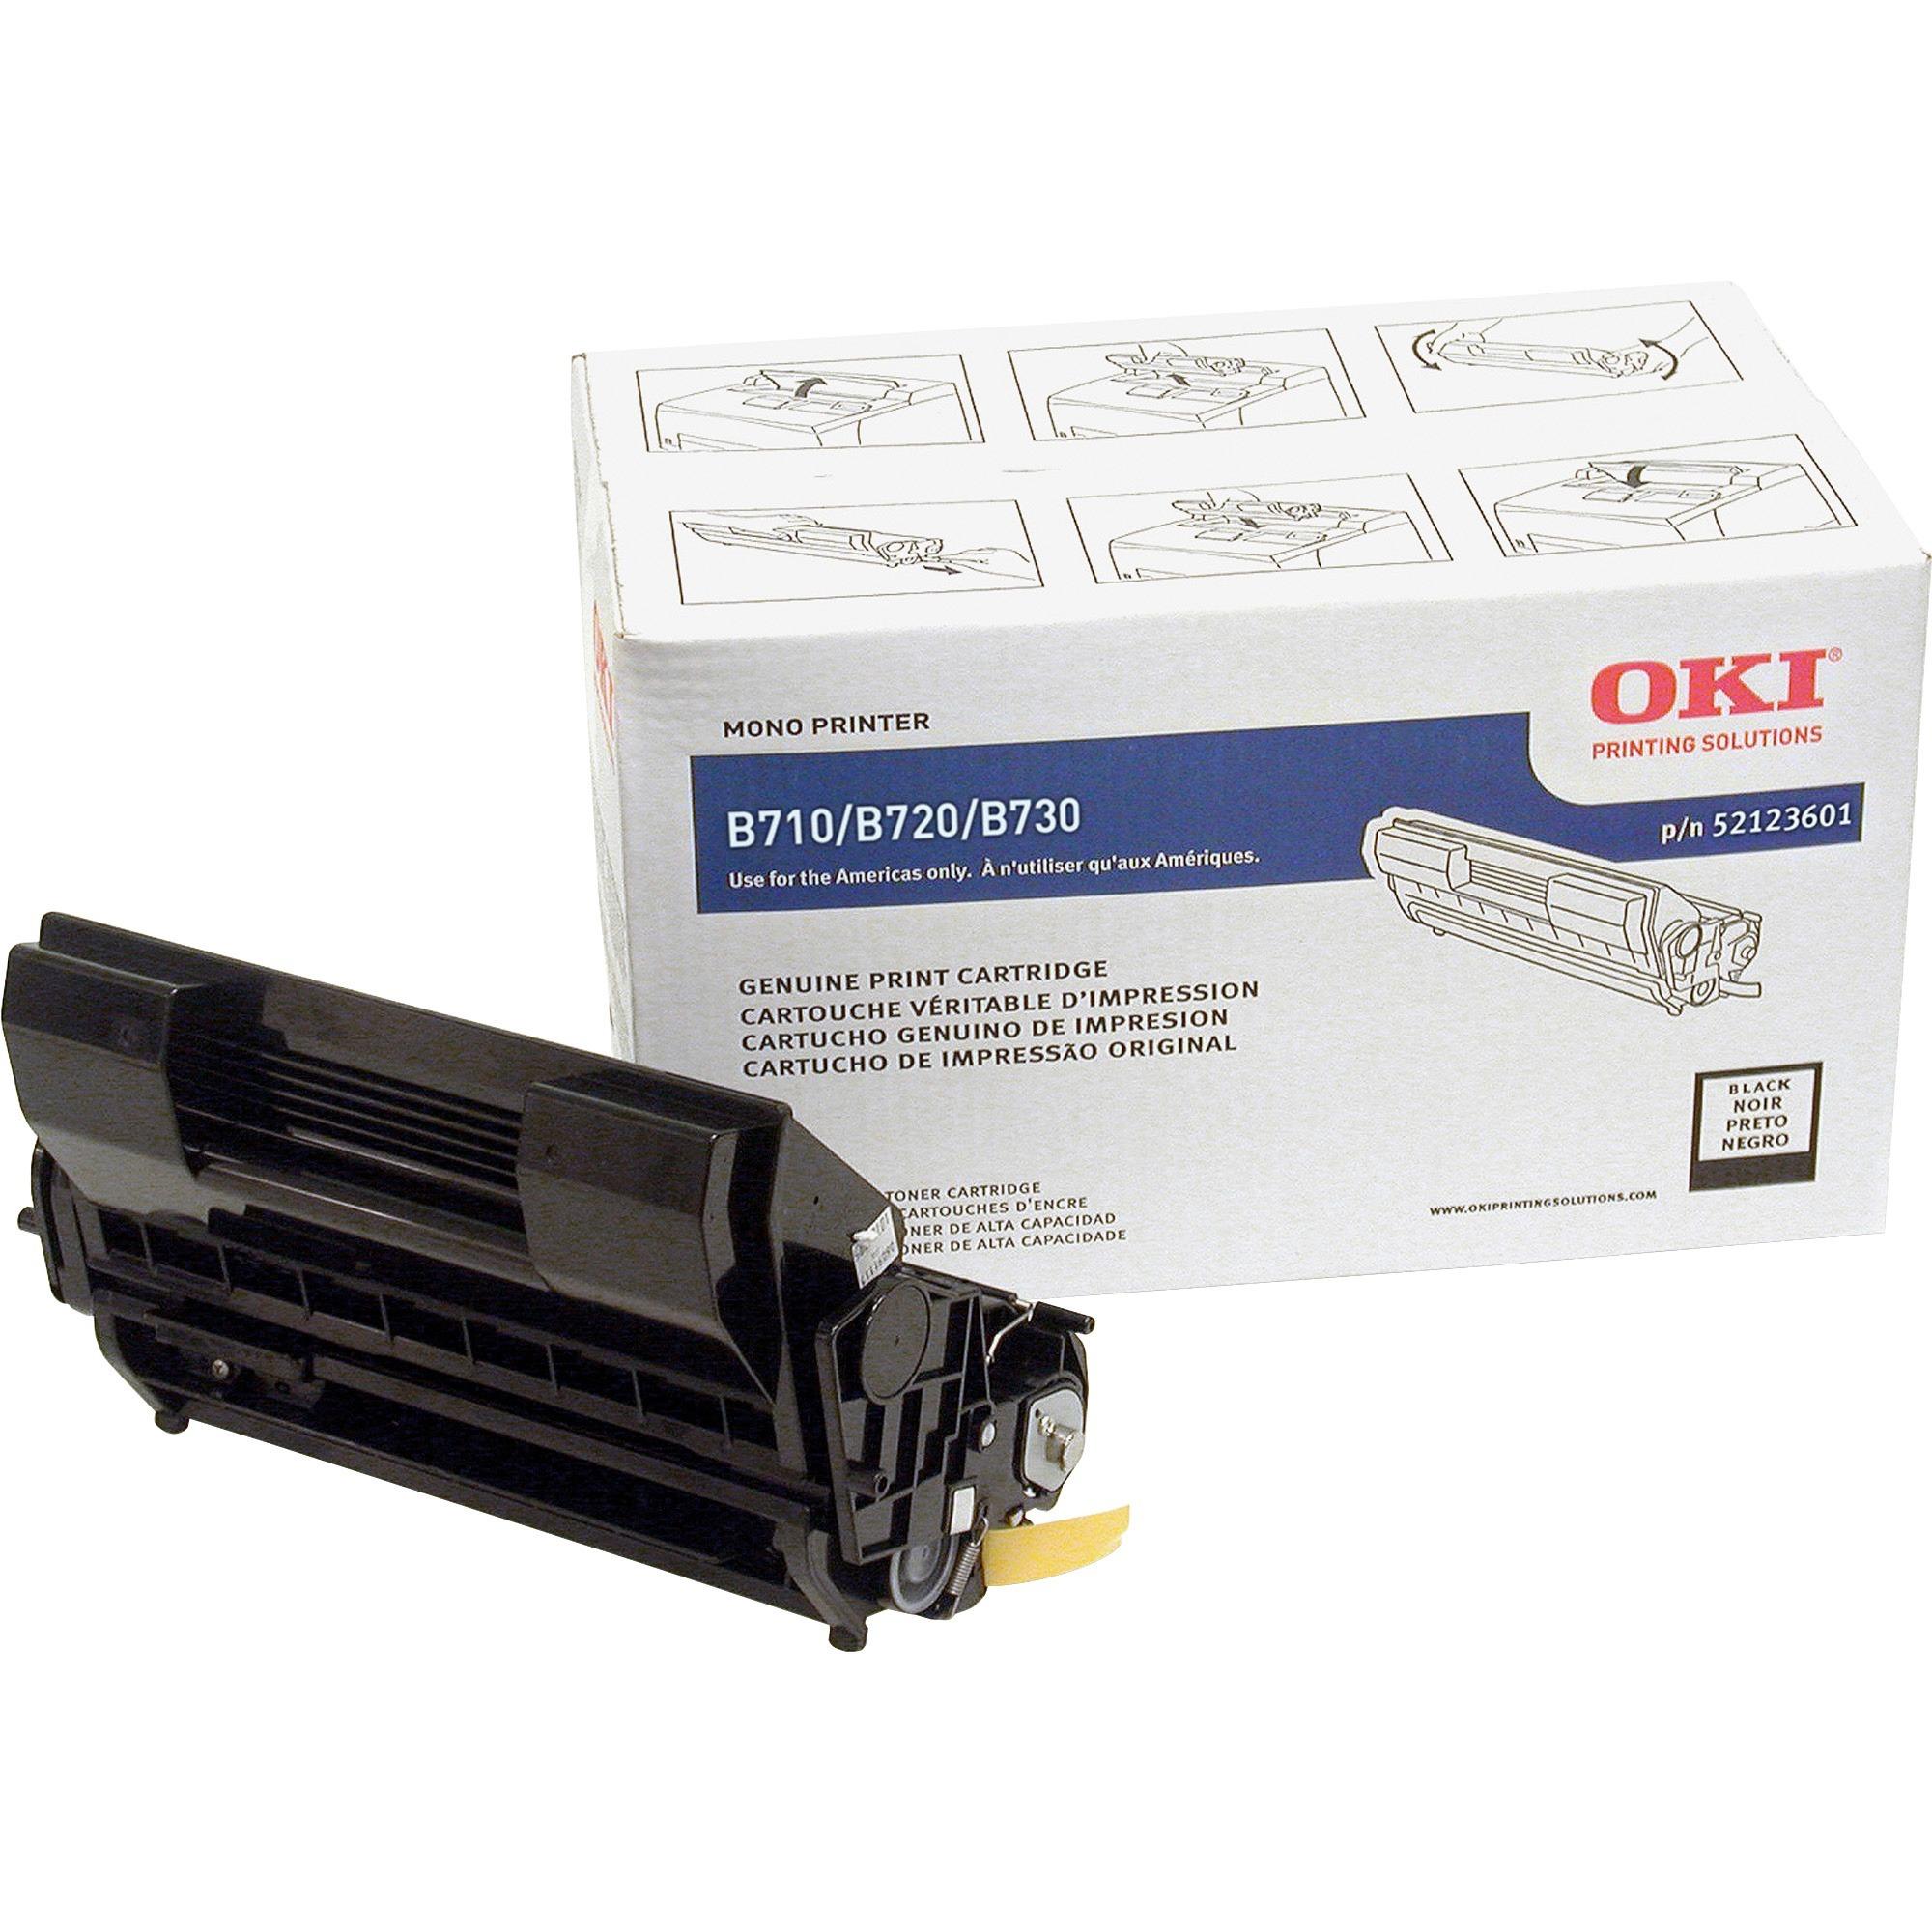 Oki, OKI52123601, 52123601 Toner Cartridge, 1 Each